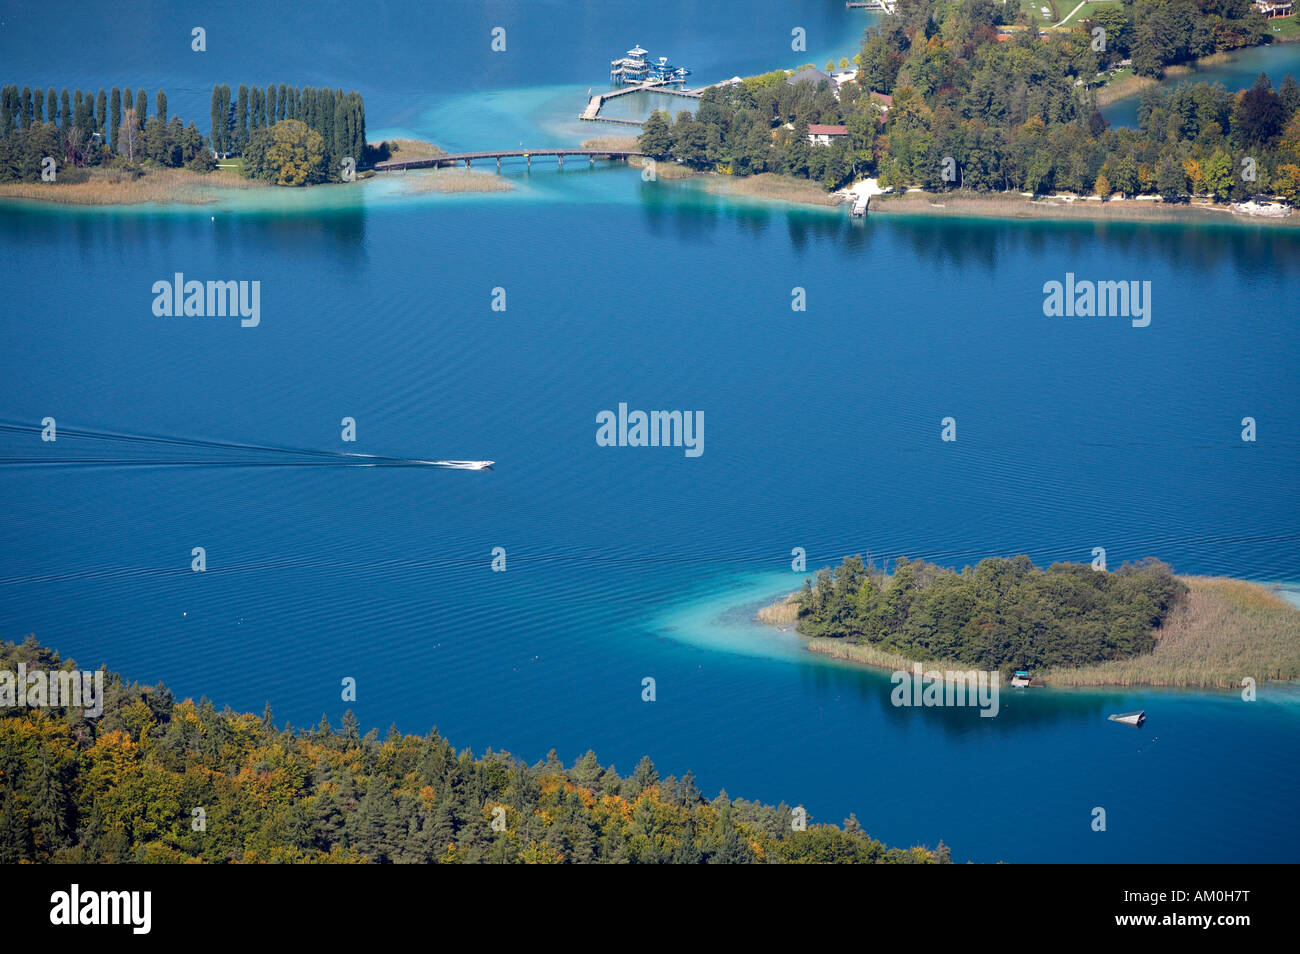 View from Pyramidenkogel to Woerthersee lake, Poertschach Landspitz, Carinthia, Austria Stock Photo